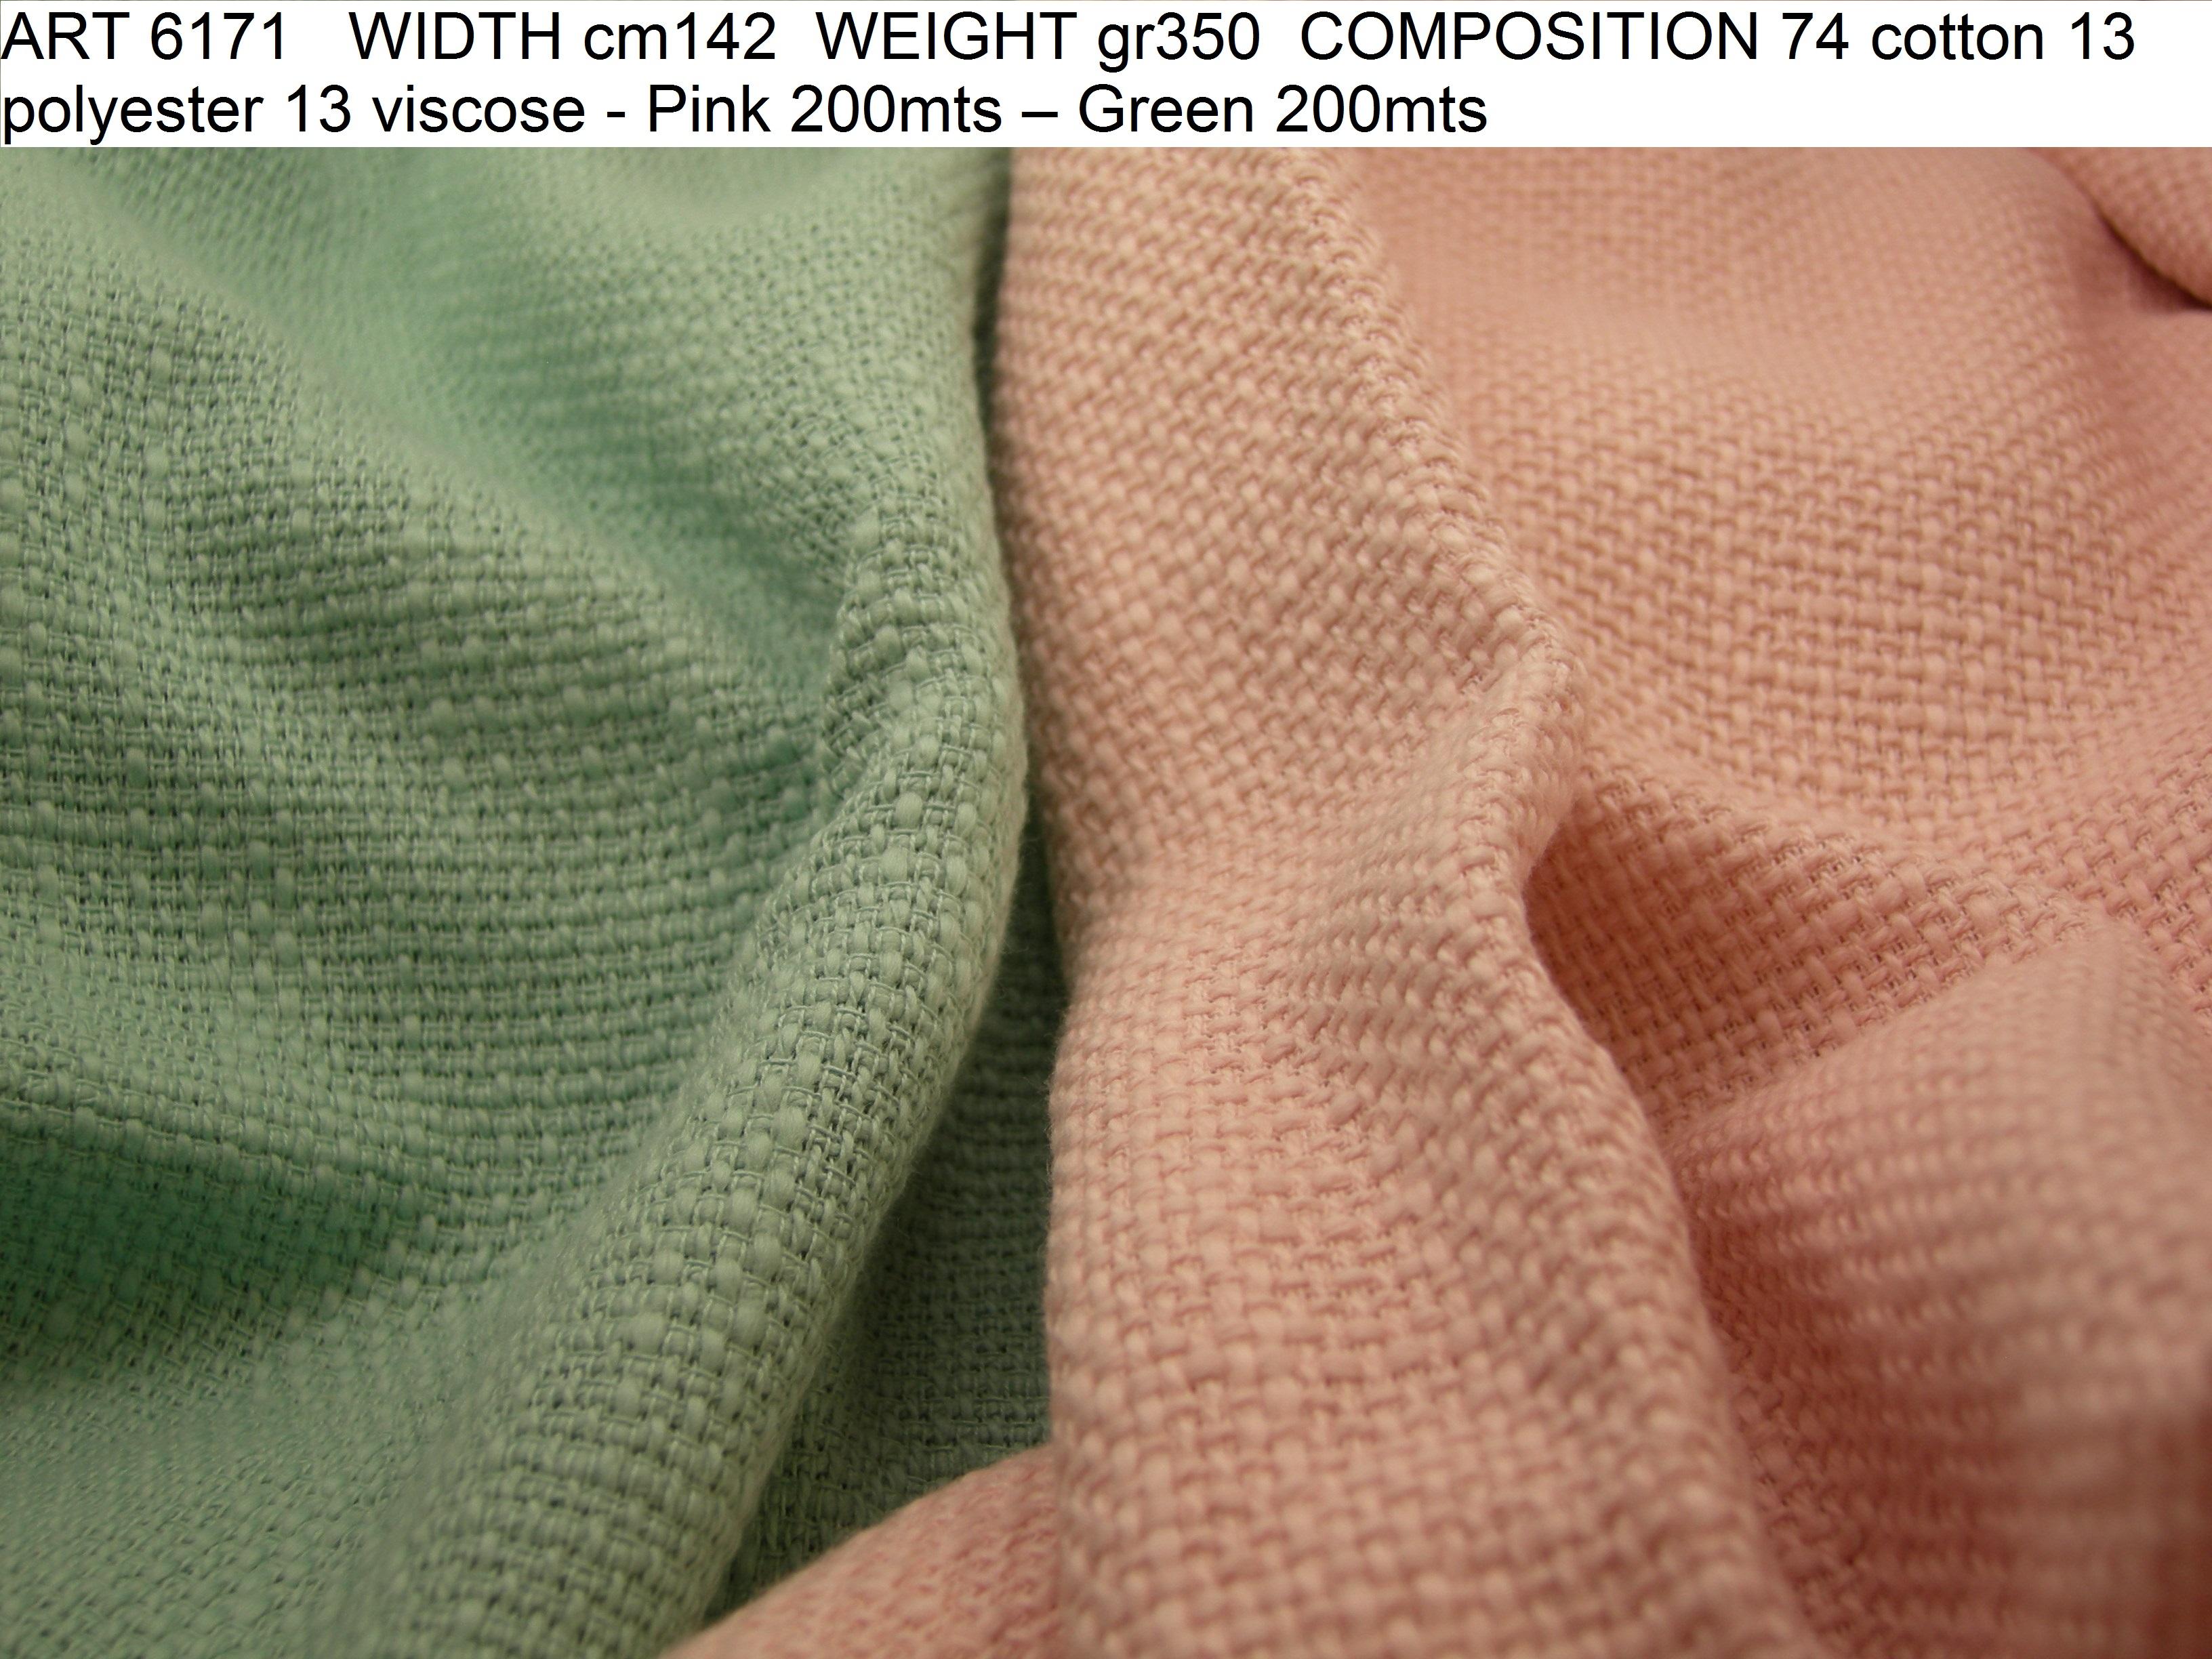 ART 6171 WIDTH cm142 WEIGHT gr350 COMPOSITION 74 cotton 13 polyester 13 viscose - Pink 200mts – Green 200mts